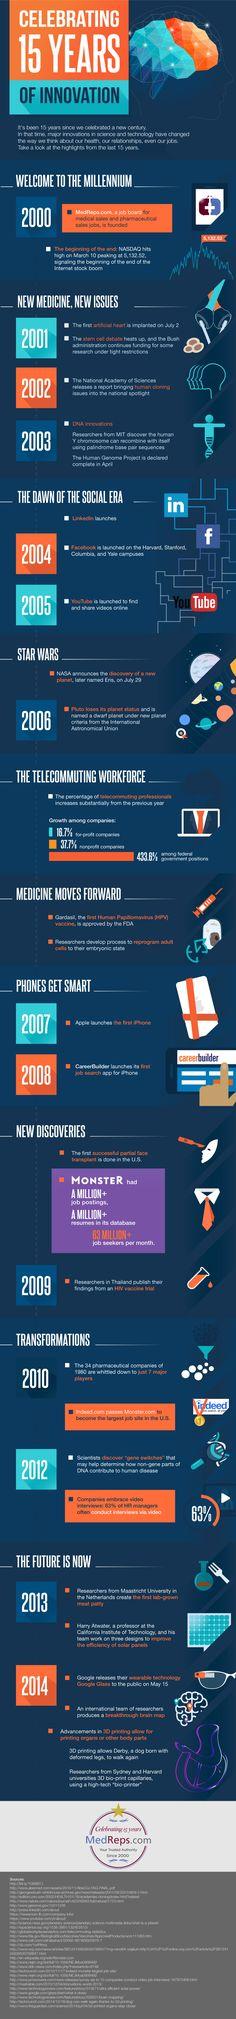 Celebrating 15 Years of Innovation